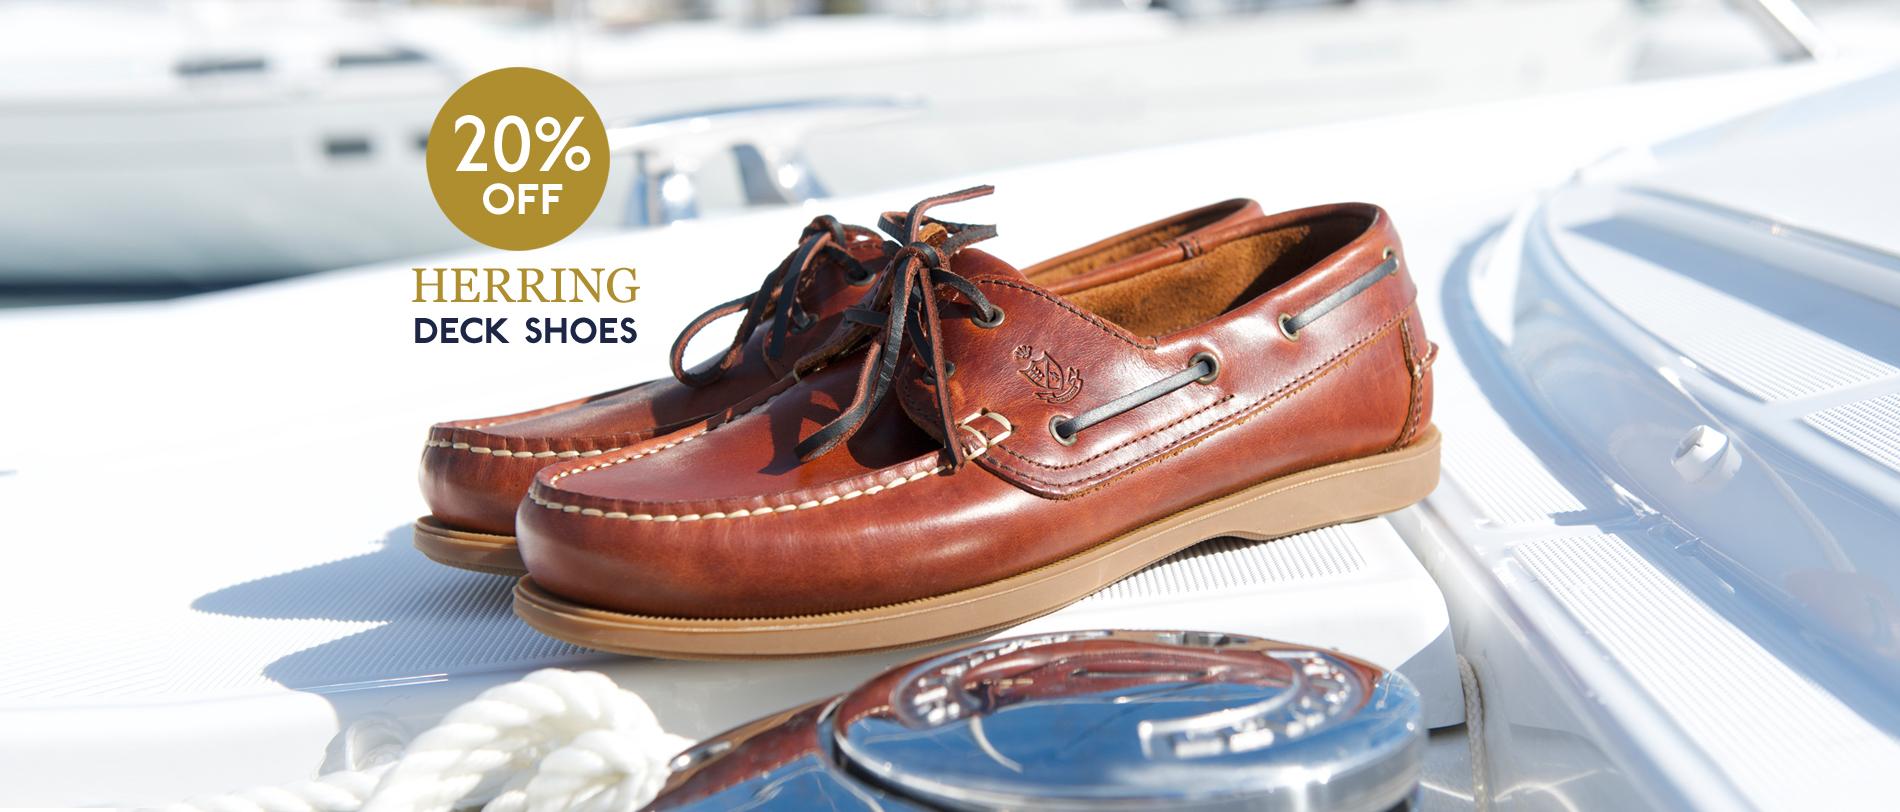 Fantastic summer shoes at 20% off